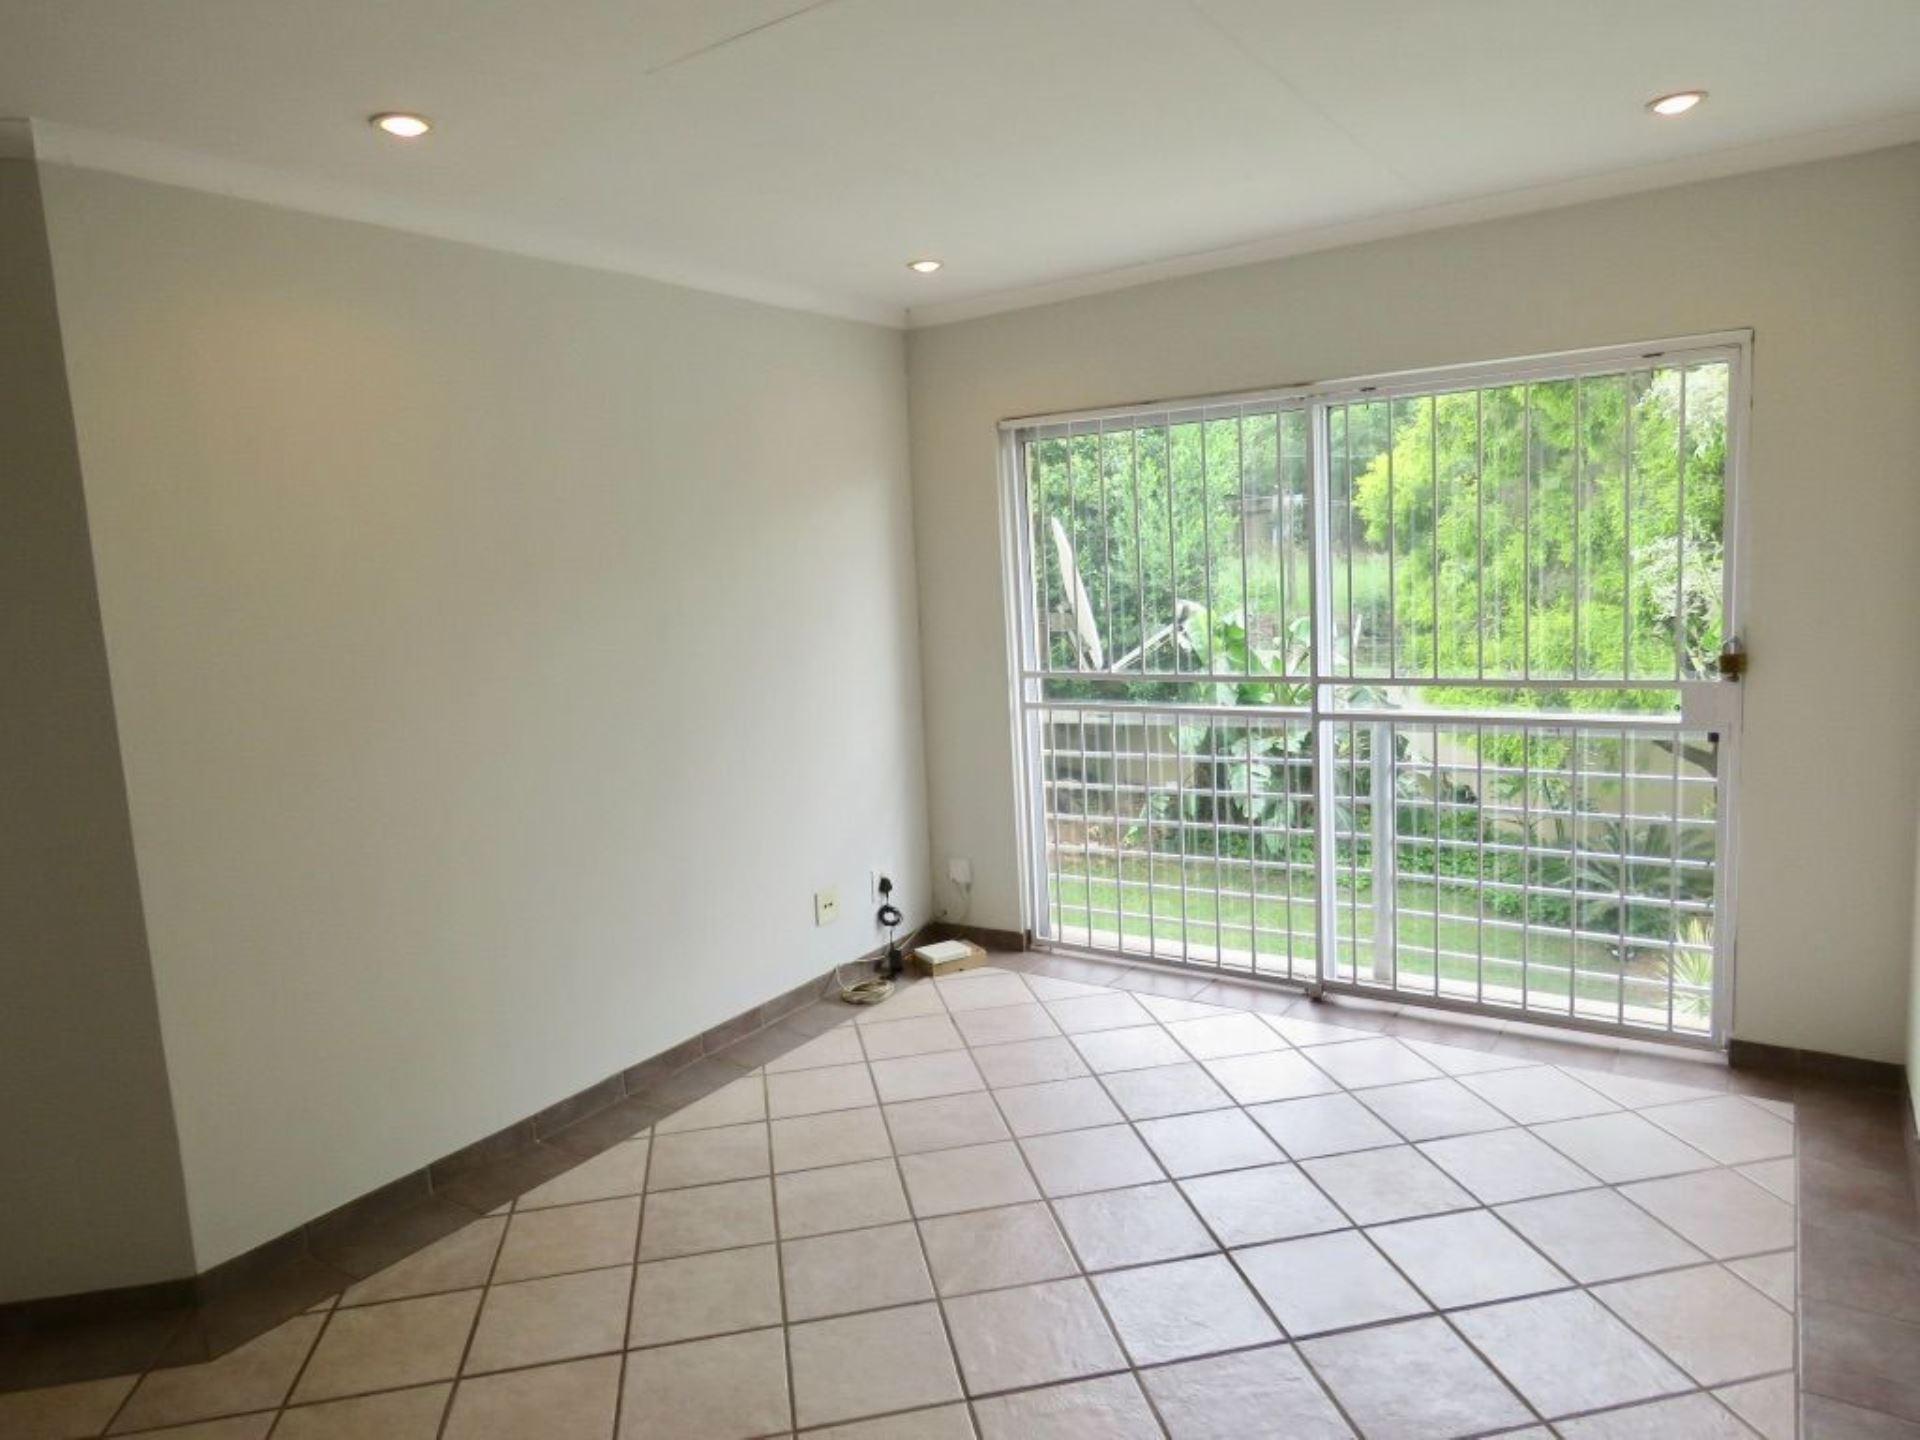 Apartment Rental Monthly in ERASMUSKLOOF EXT 3